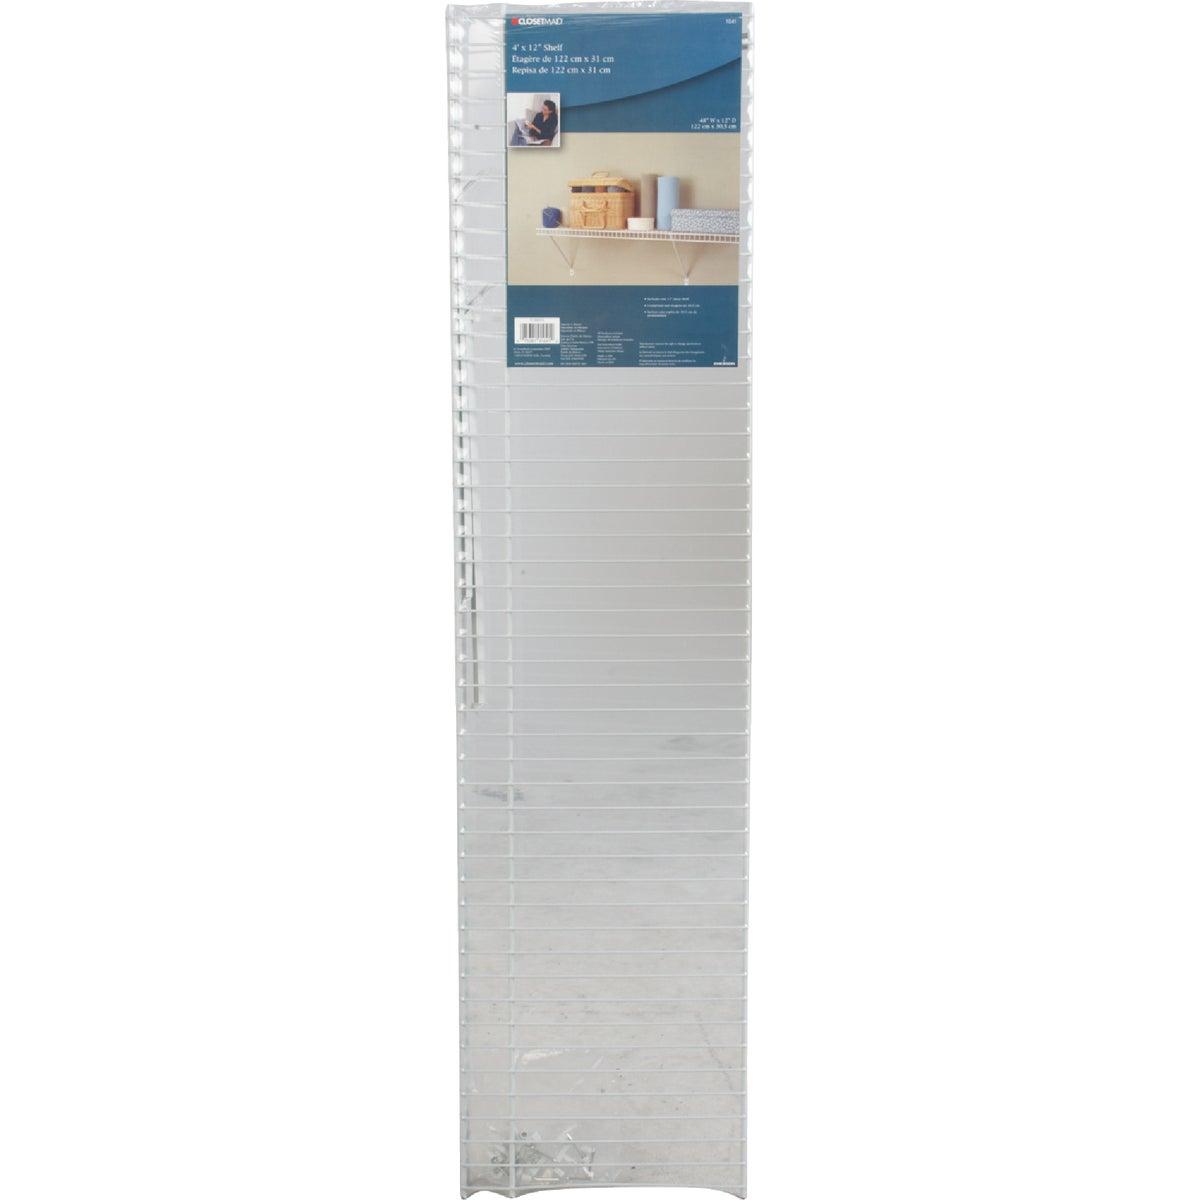 ClosetMaid 4 Ft. W. x 12 In. D Ventilated Shelf Kit, White